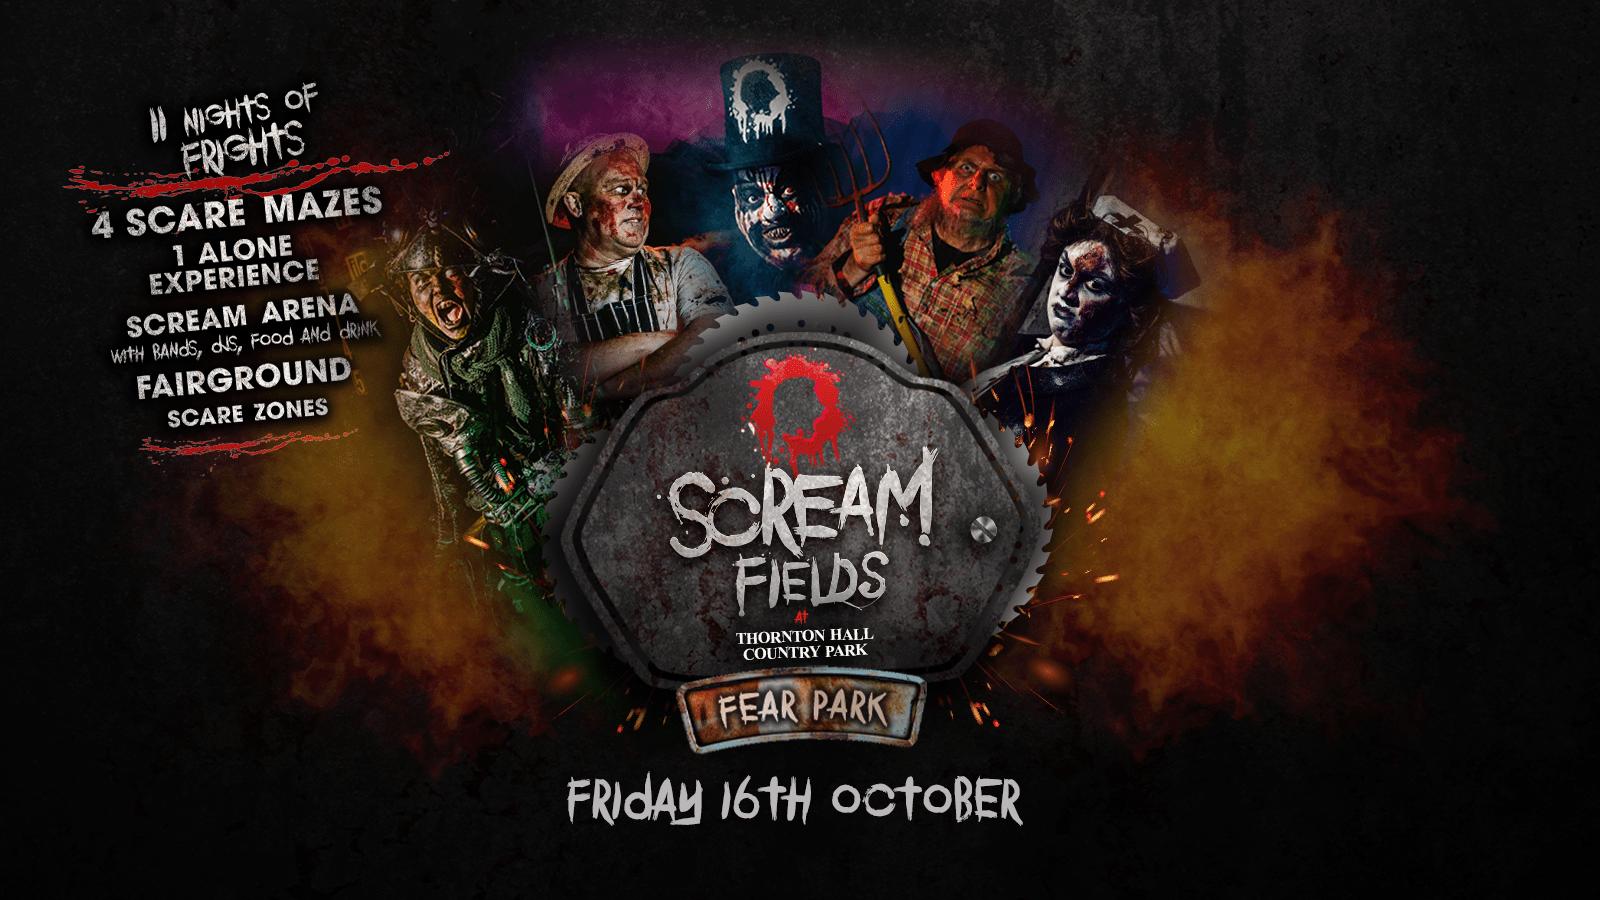 6.45PM – Screamfields: Friday 16th October 2020